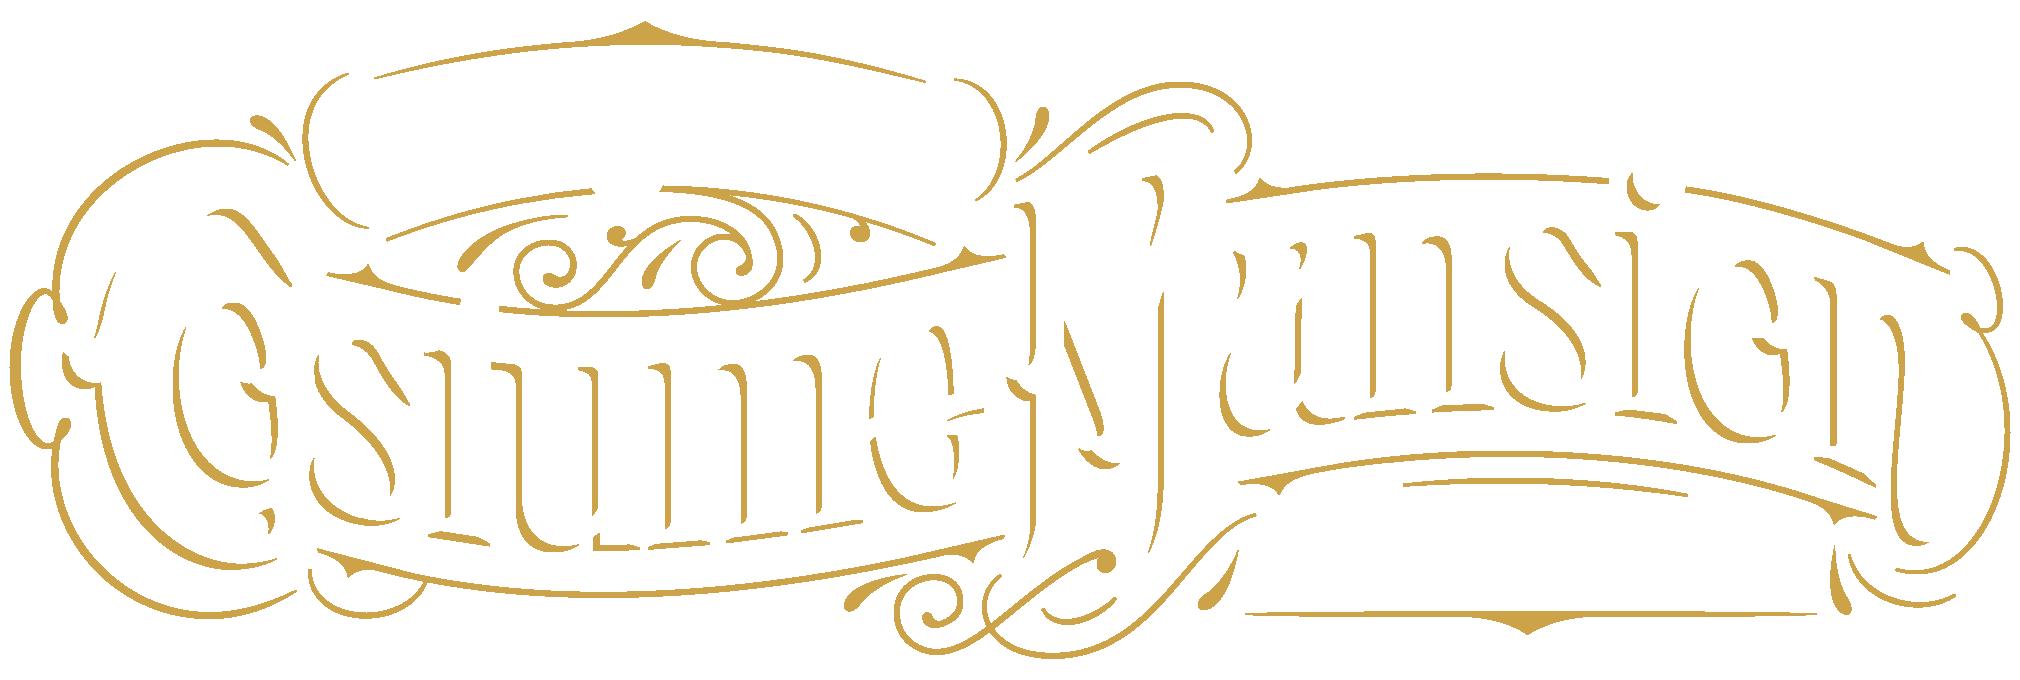 Evangeline's Costume Mansion Logo